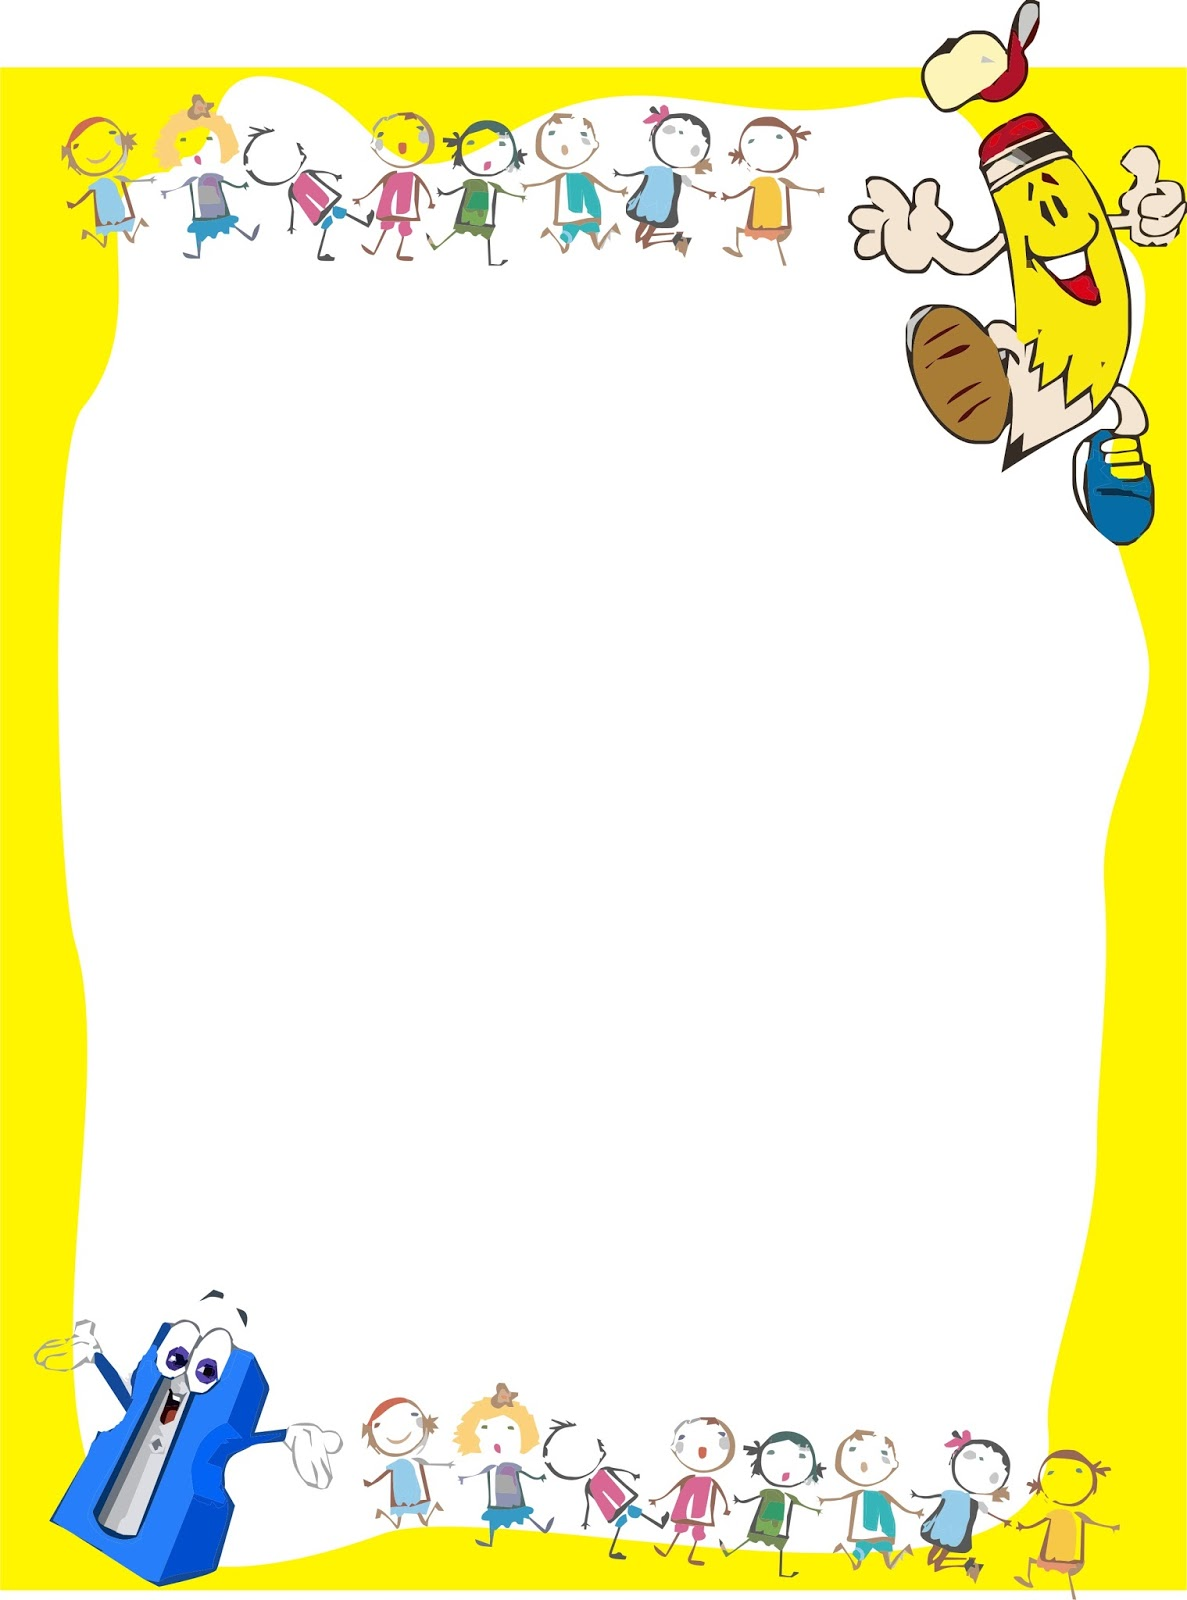 Dibujos de útiles escolares para pintar | Colorear imágenes